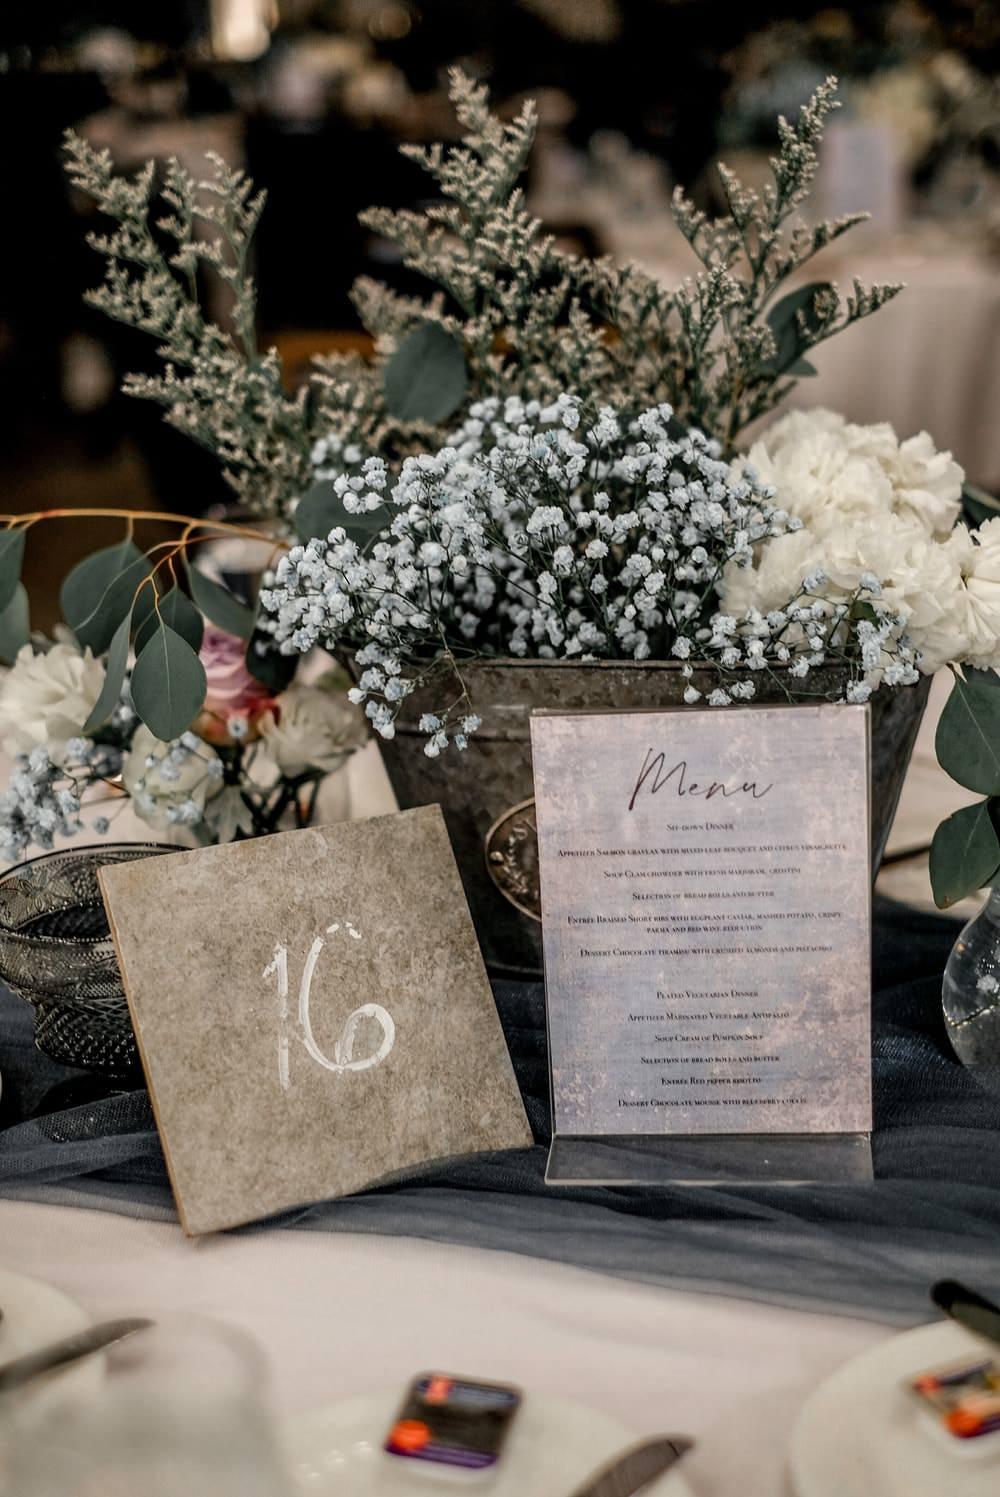 Centrepiece Flowers Decor Table Name Philippines Wedding The Backyard Studios